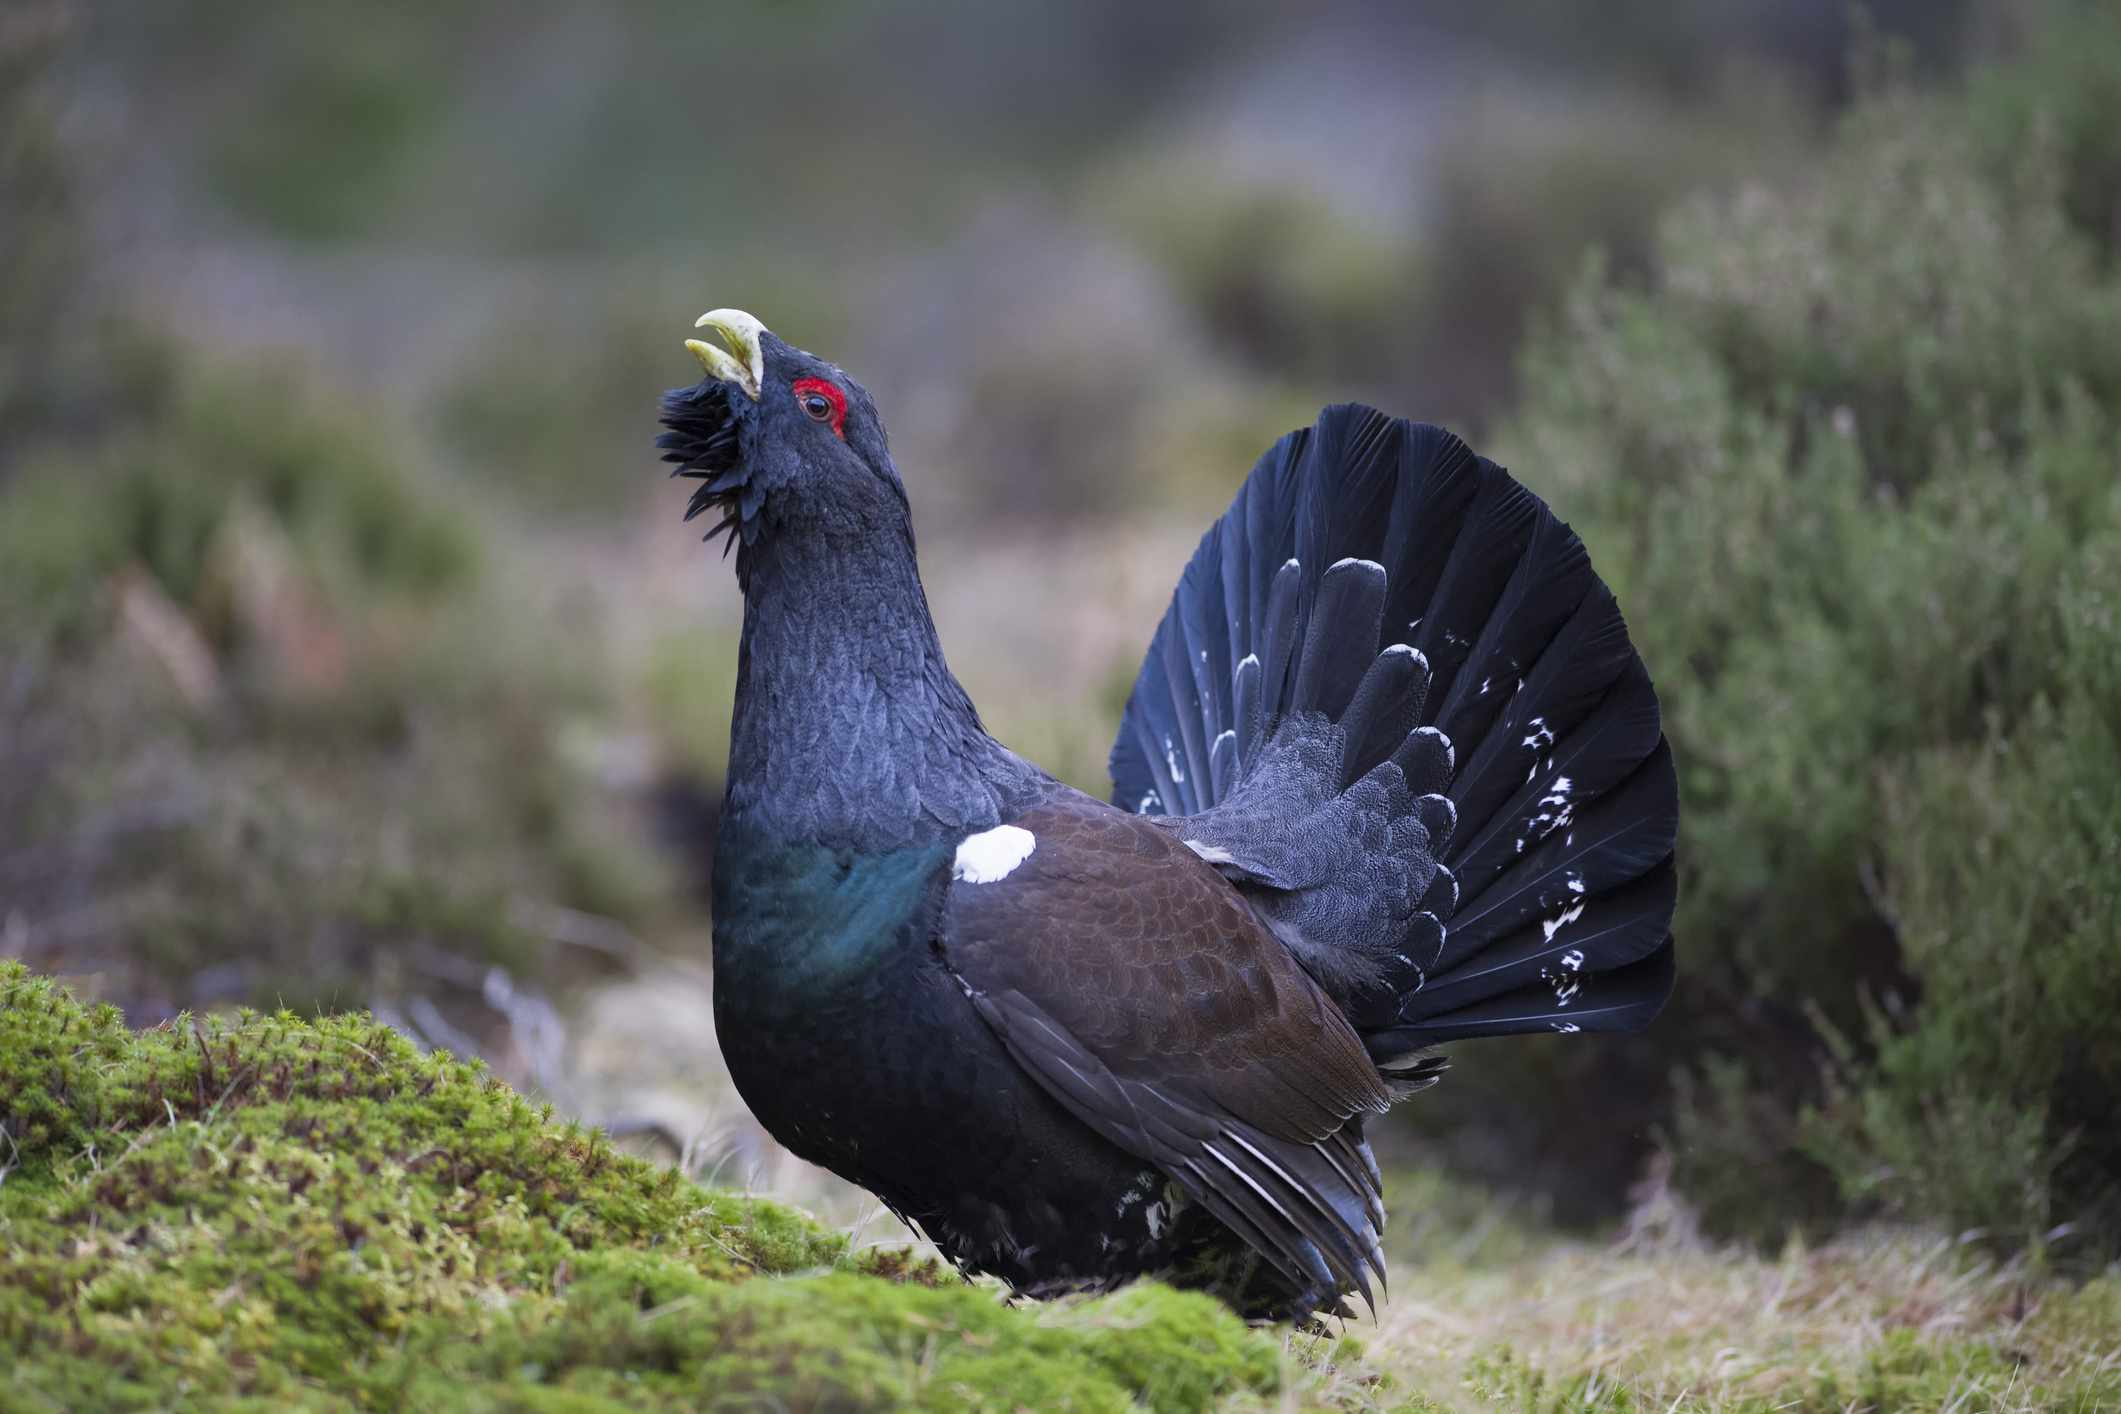 Male capercaillie calling, Scotland